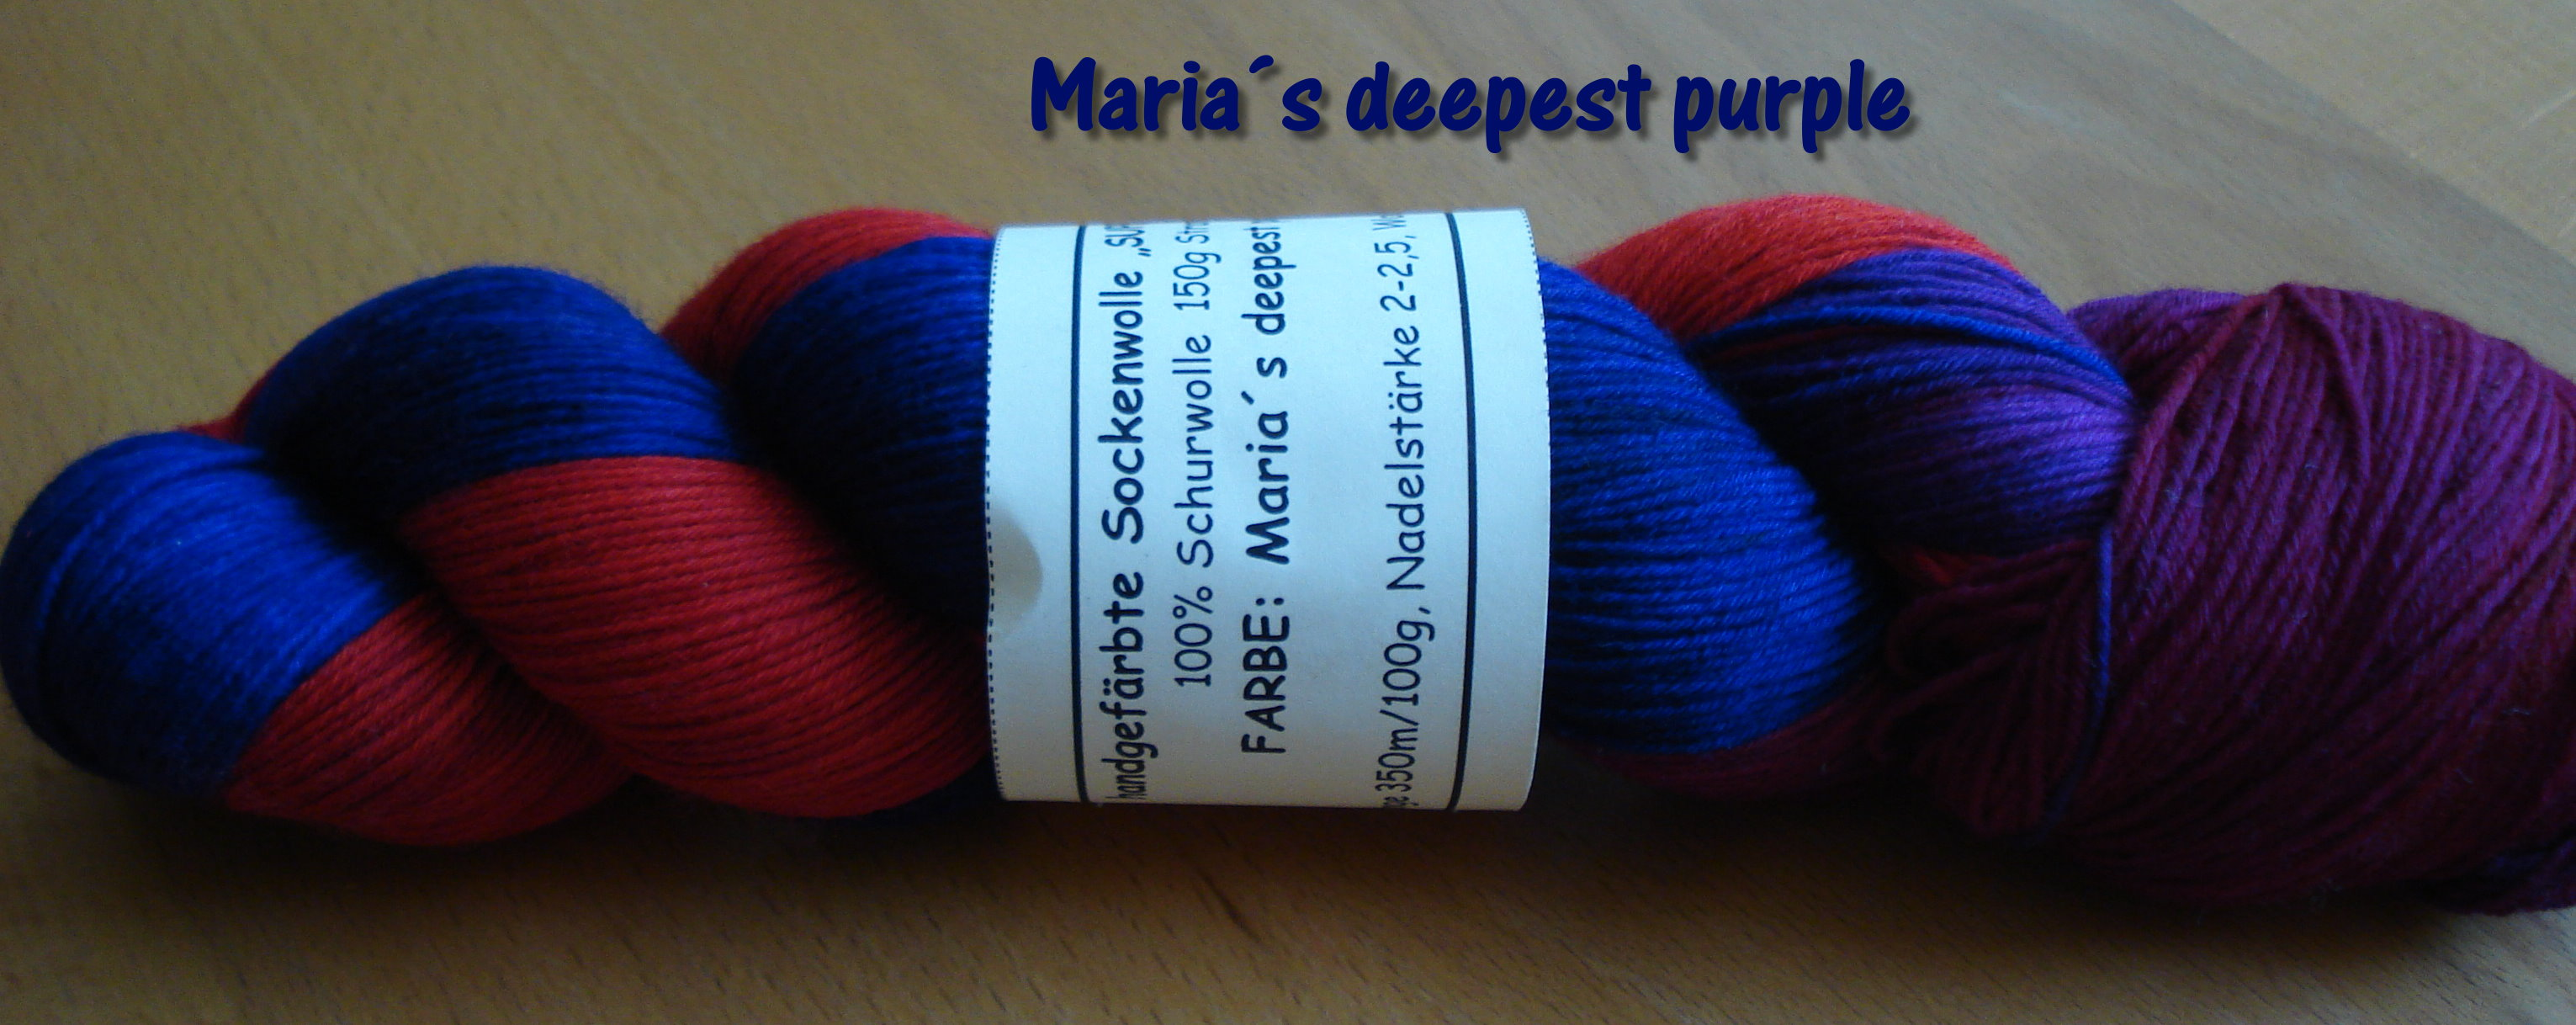 wollmeise-marias-deepest-purple.JPG